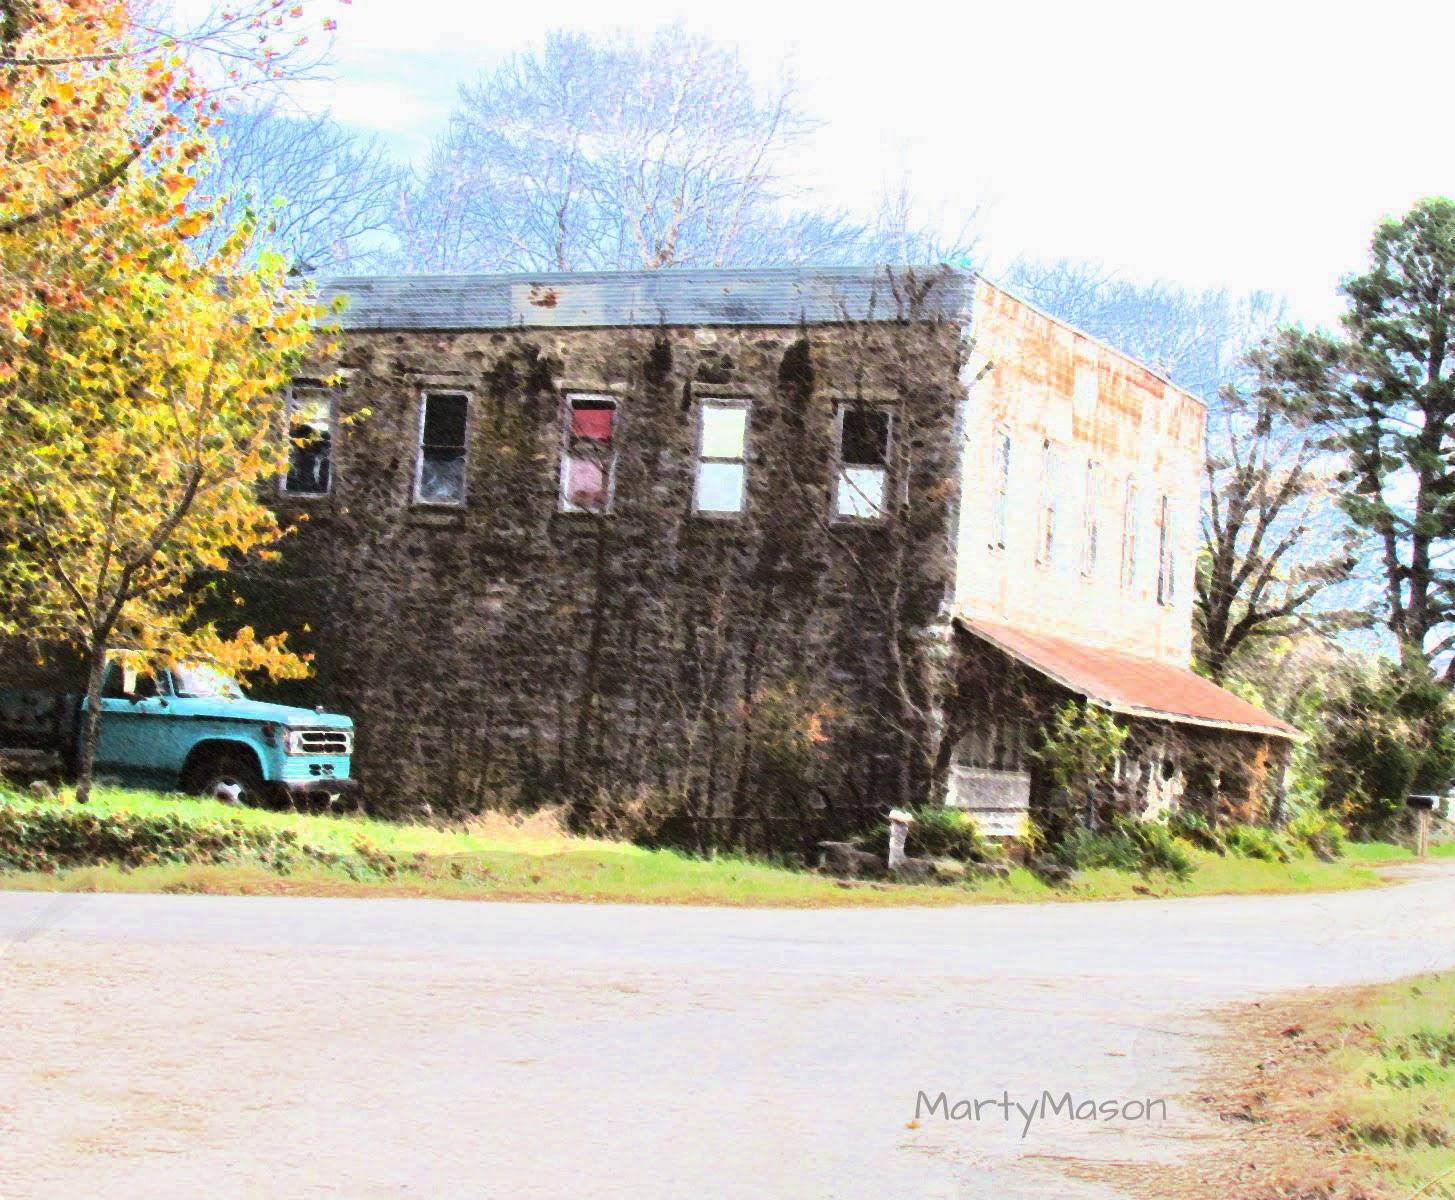 Abandoned Building in Parthenon, Arkansas